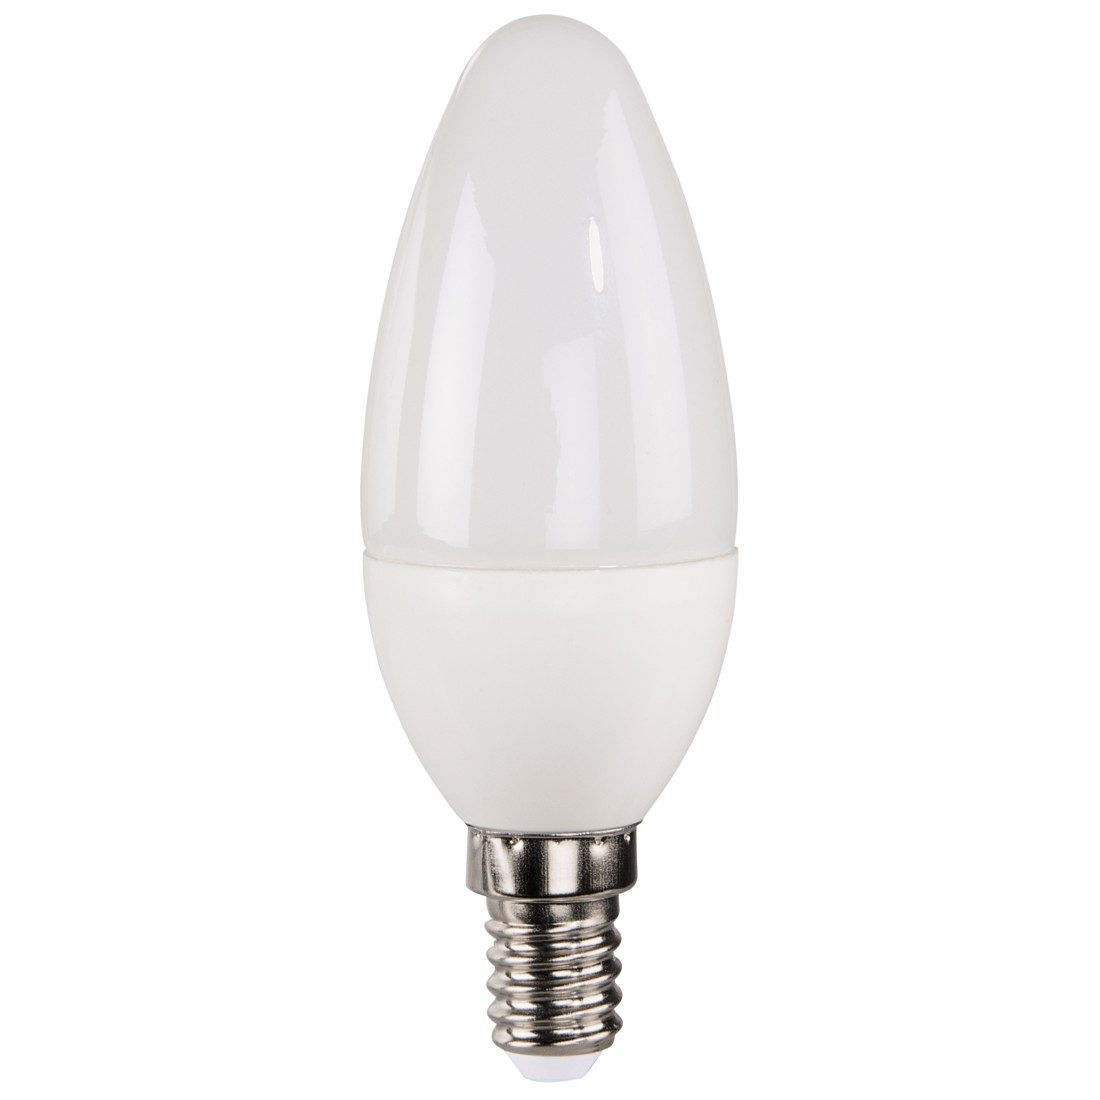 Xavax LED-Lampe, E14, 250lm ersetzt 25W Kerzenlampe, Warmweiß